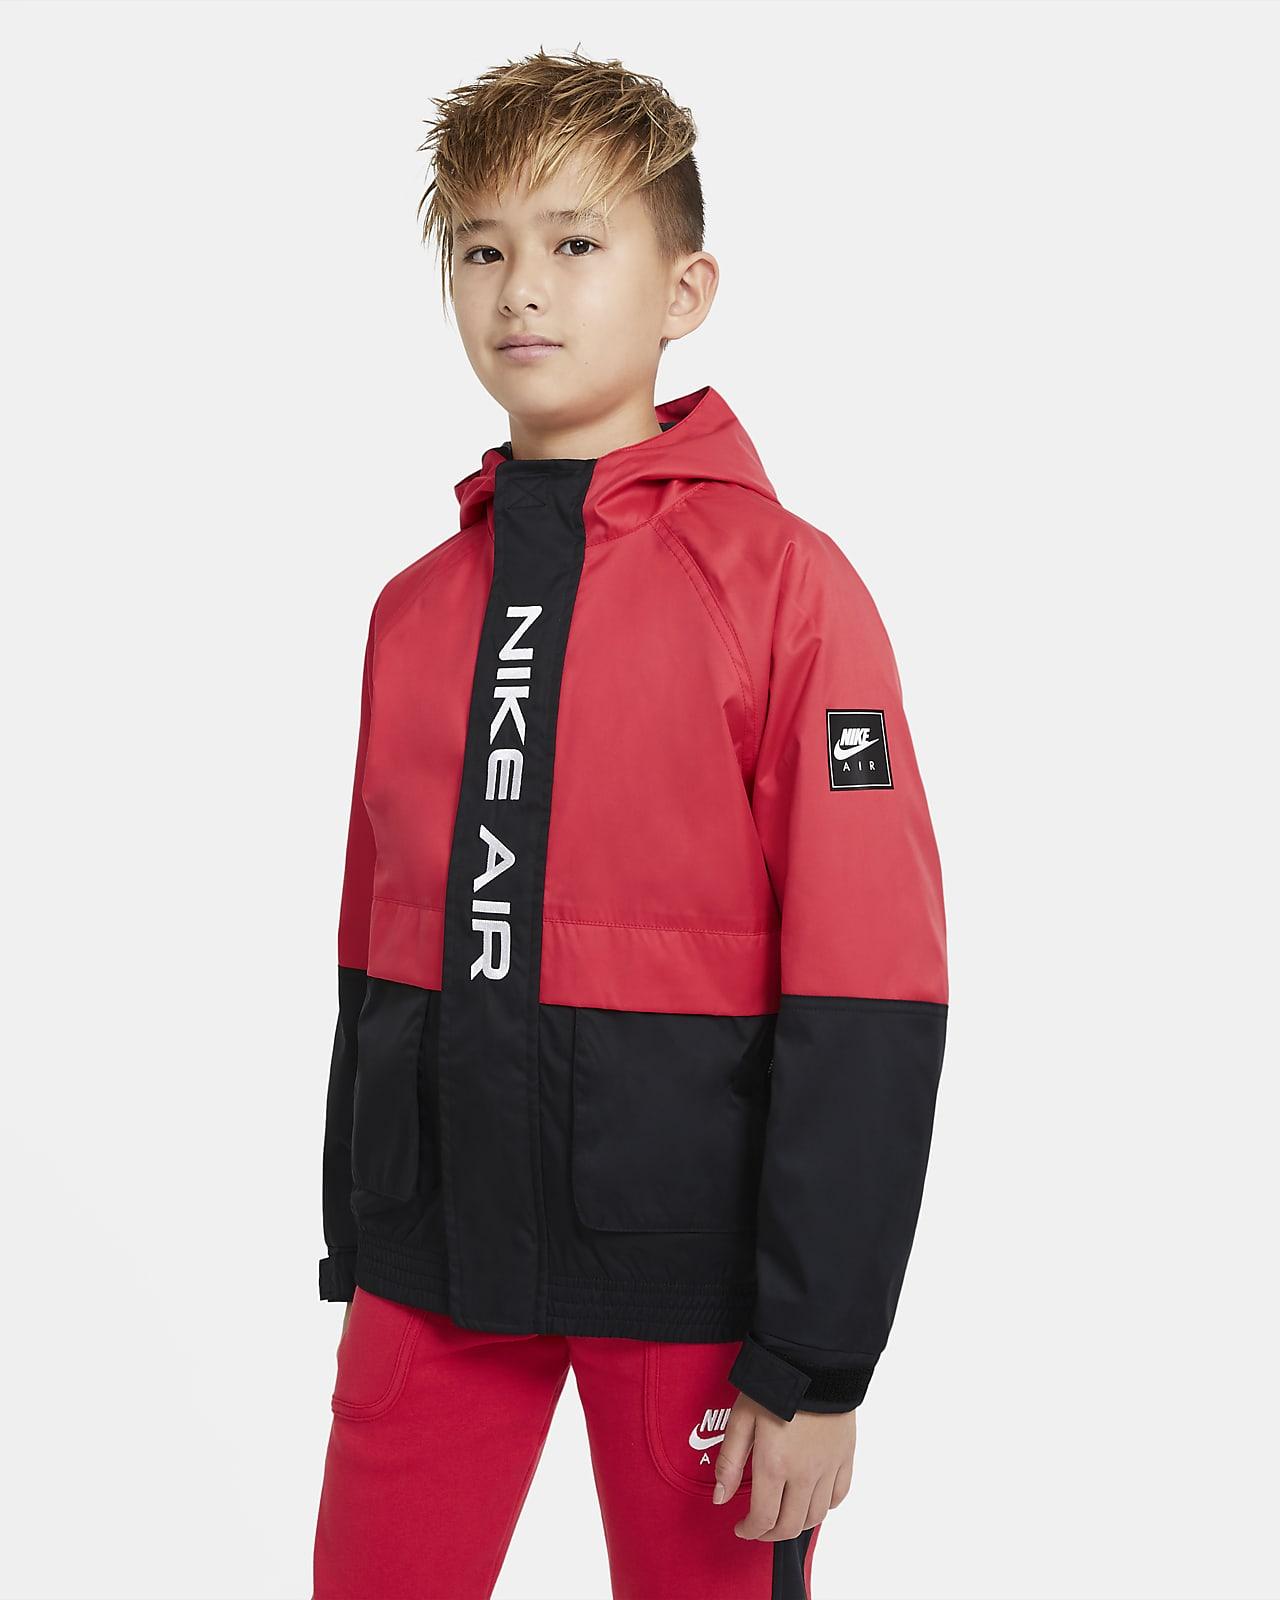 Nike Air Older Kids' (Boys') Woven Jacket